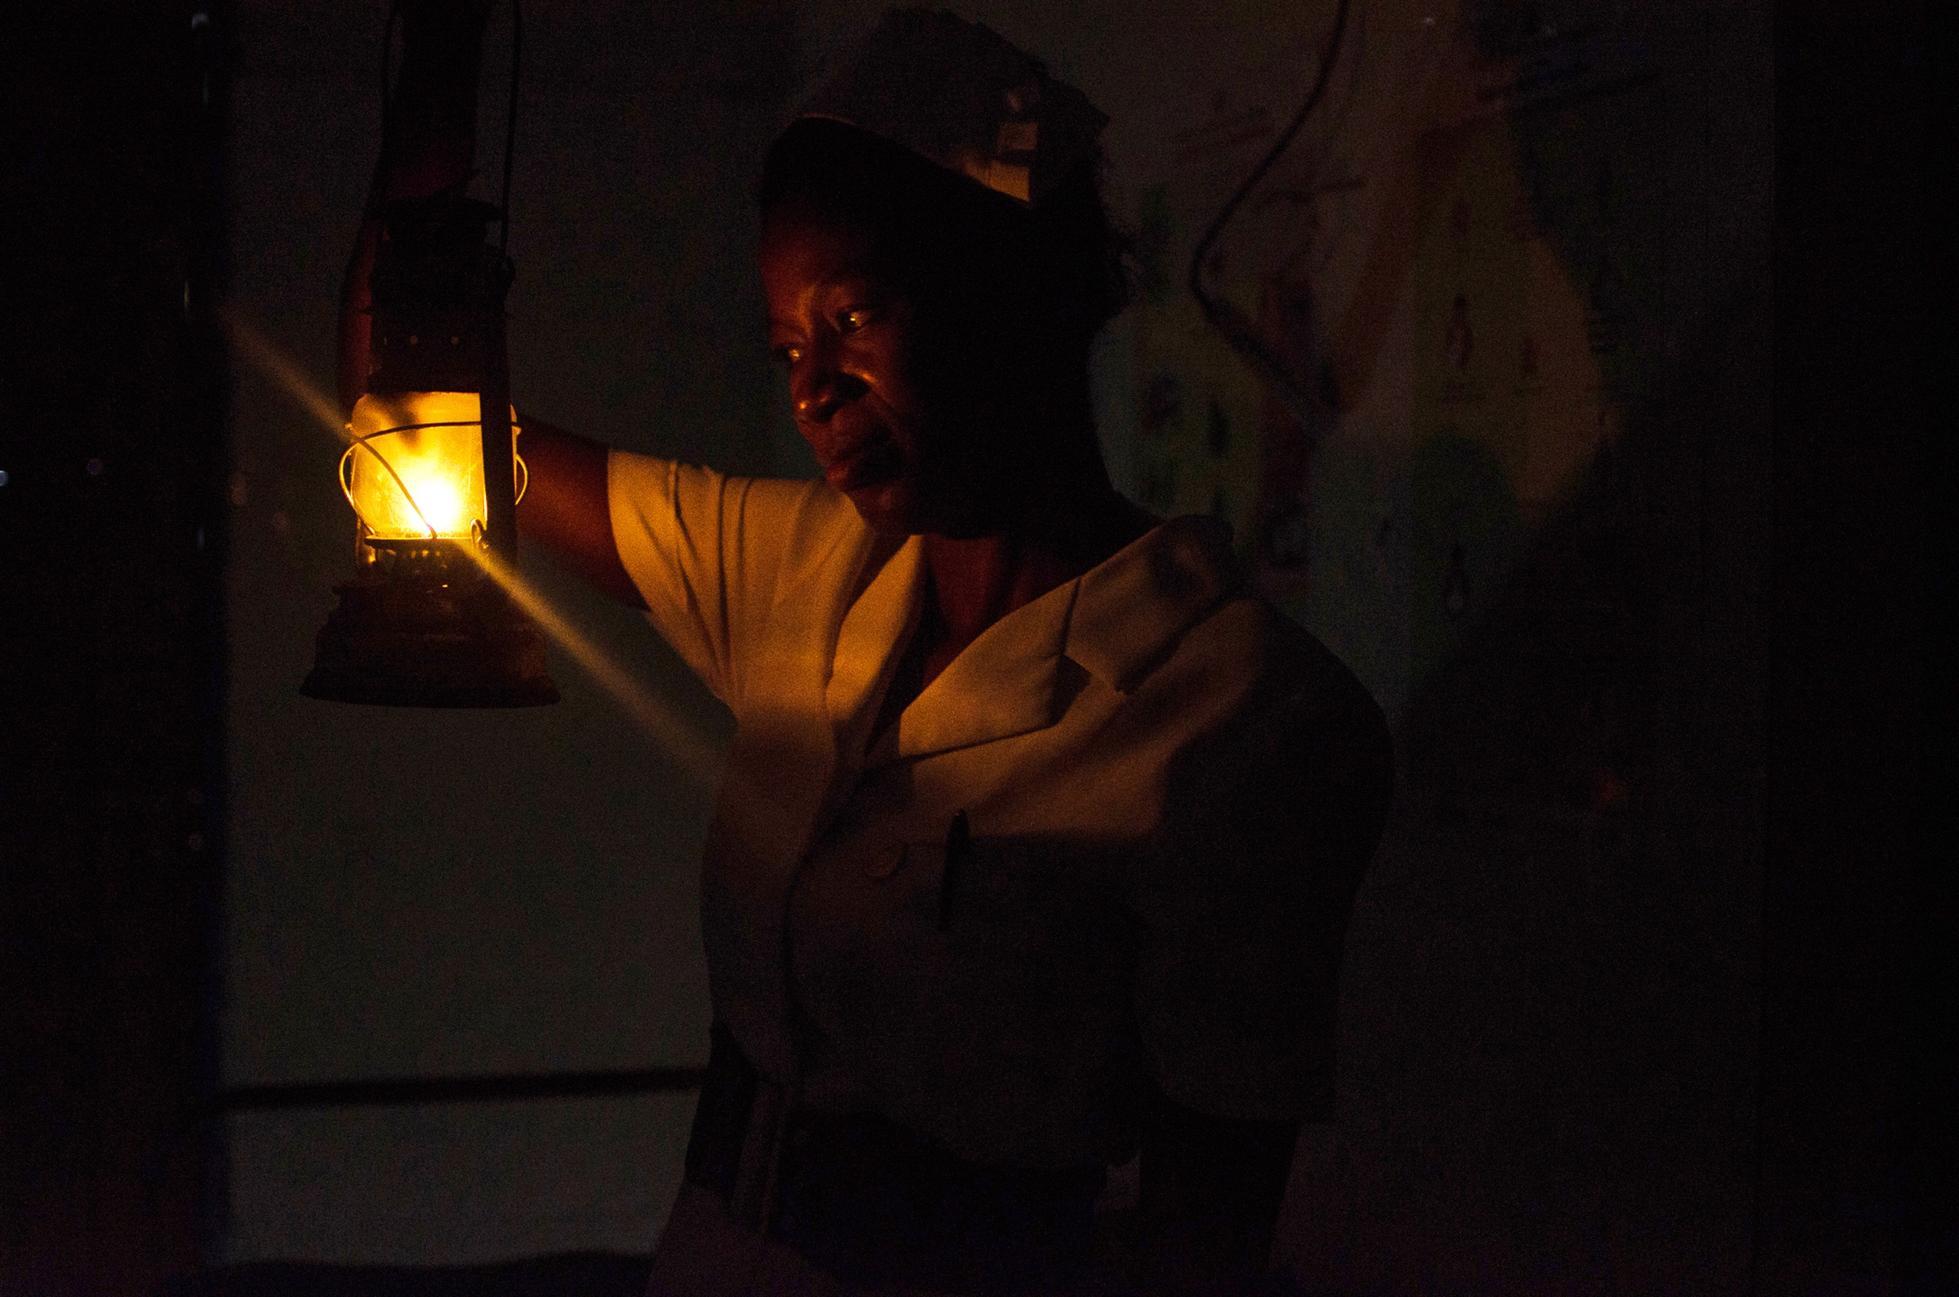 maternity ward in darkness